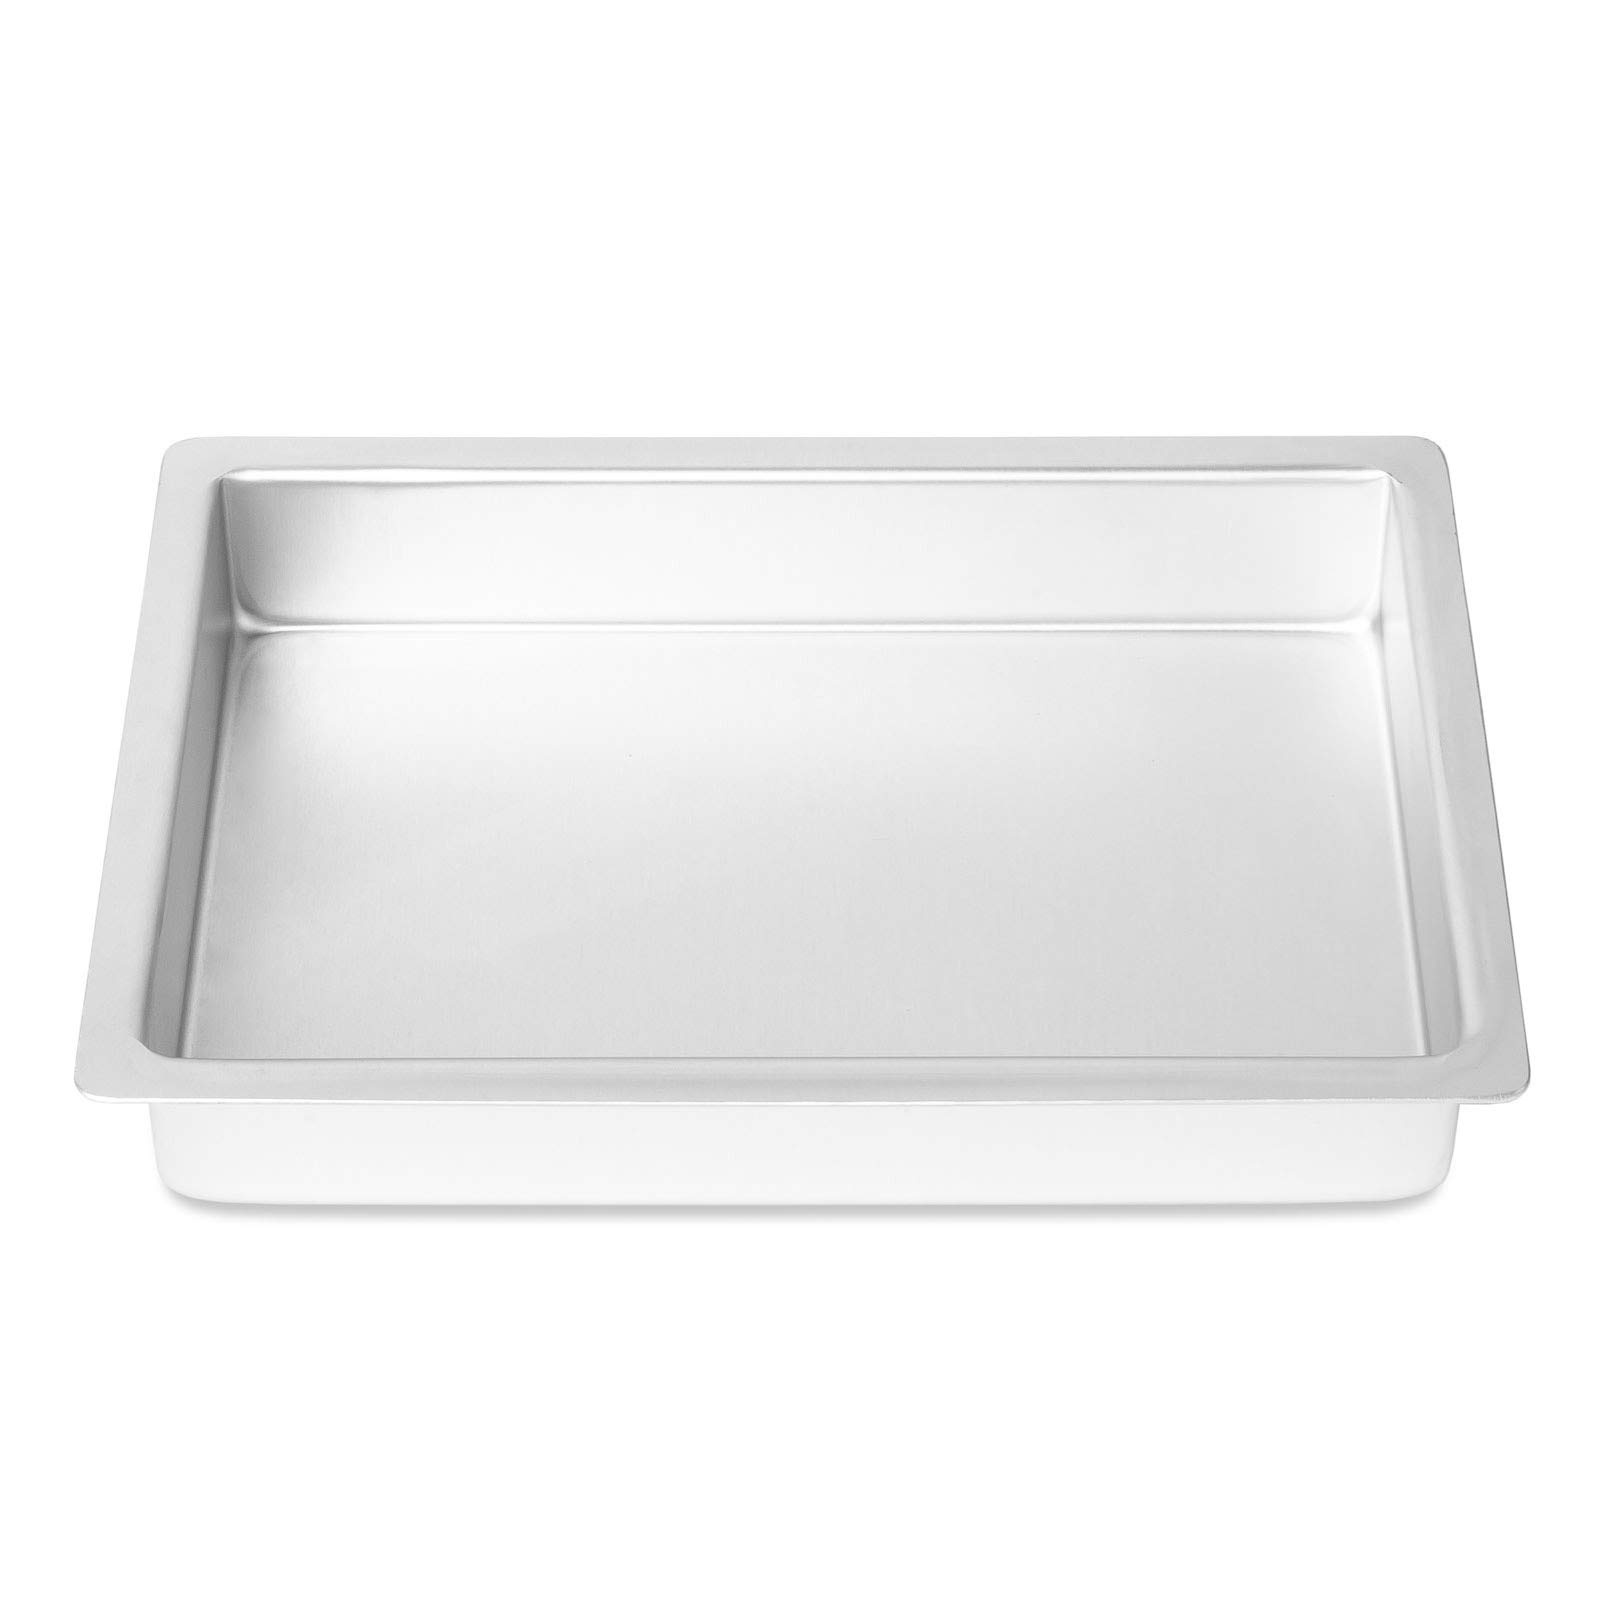 1 Pcs Professional Rectangular Aluminum Sheet Cake Pan 7 x 11 x 2 Inch #MWMN